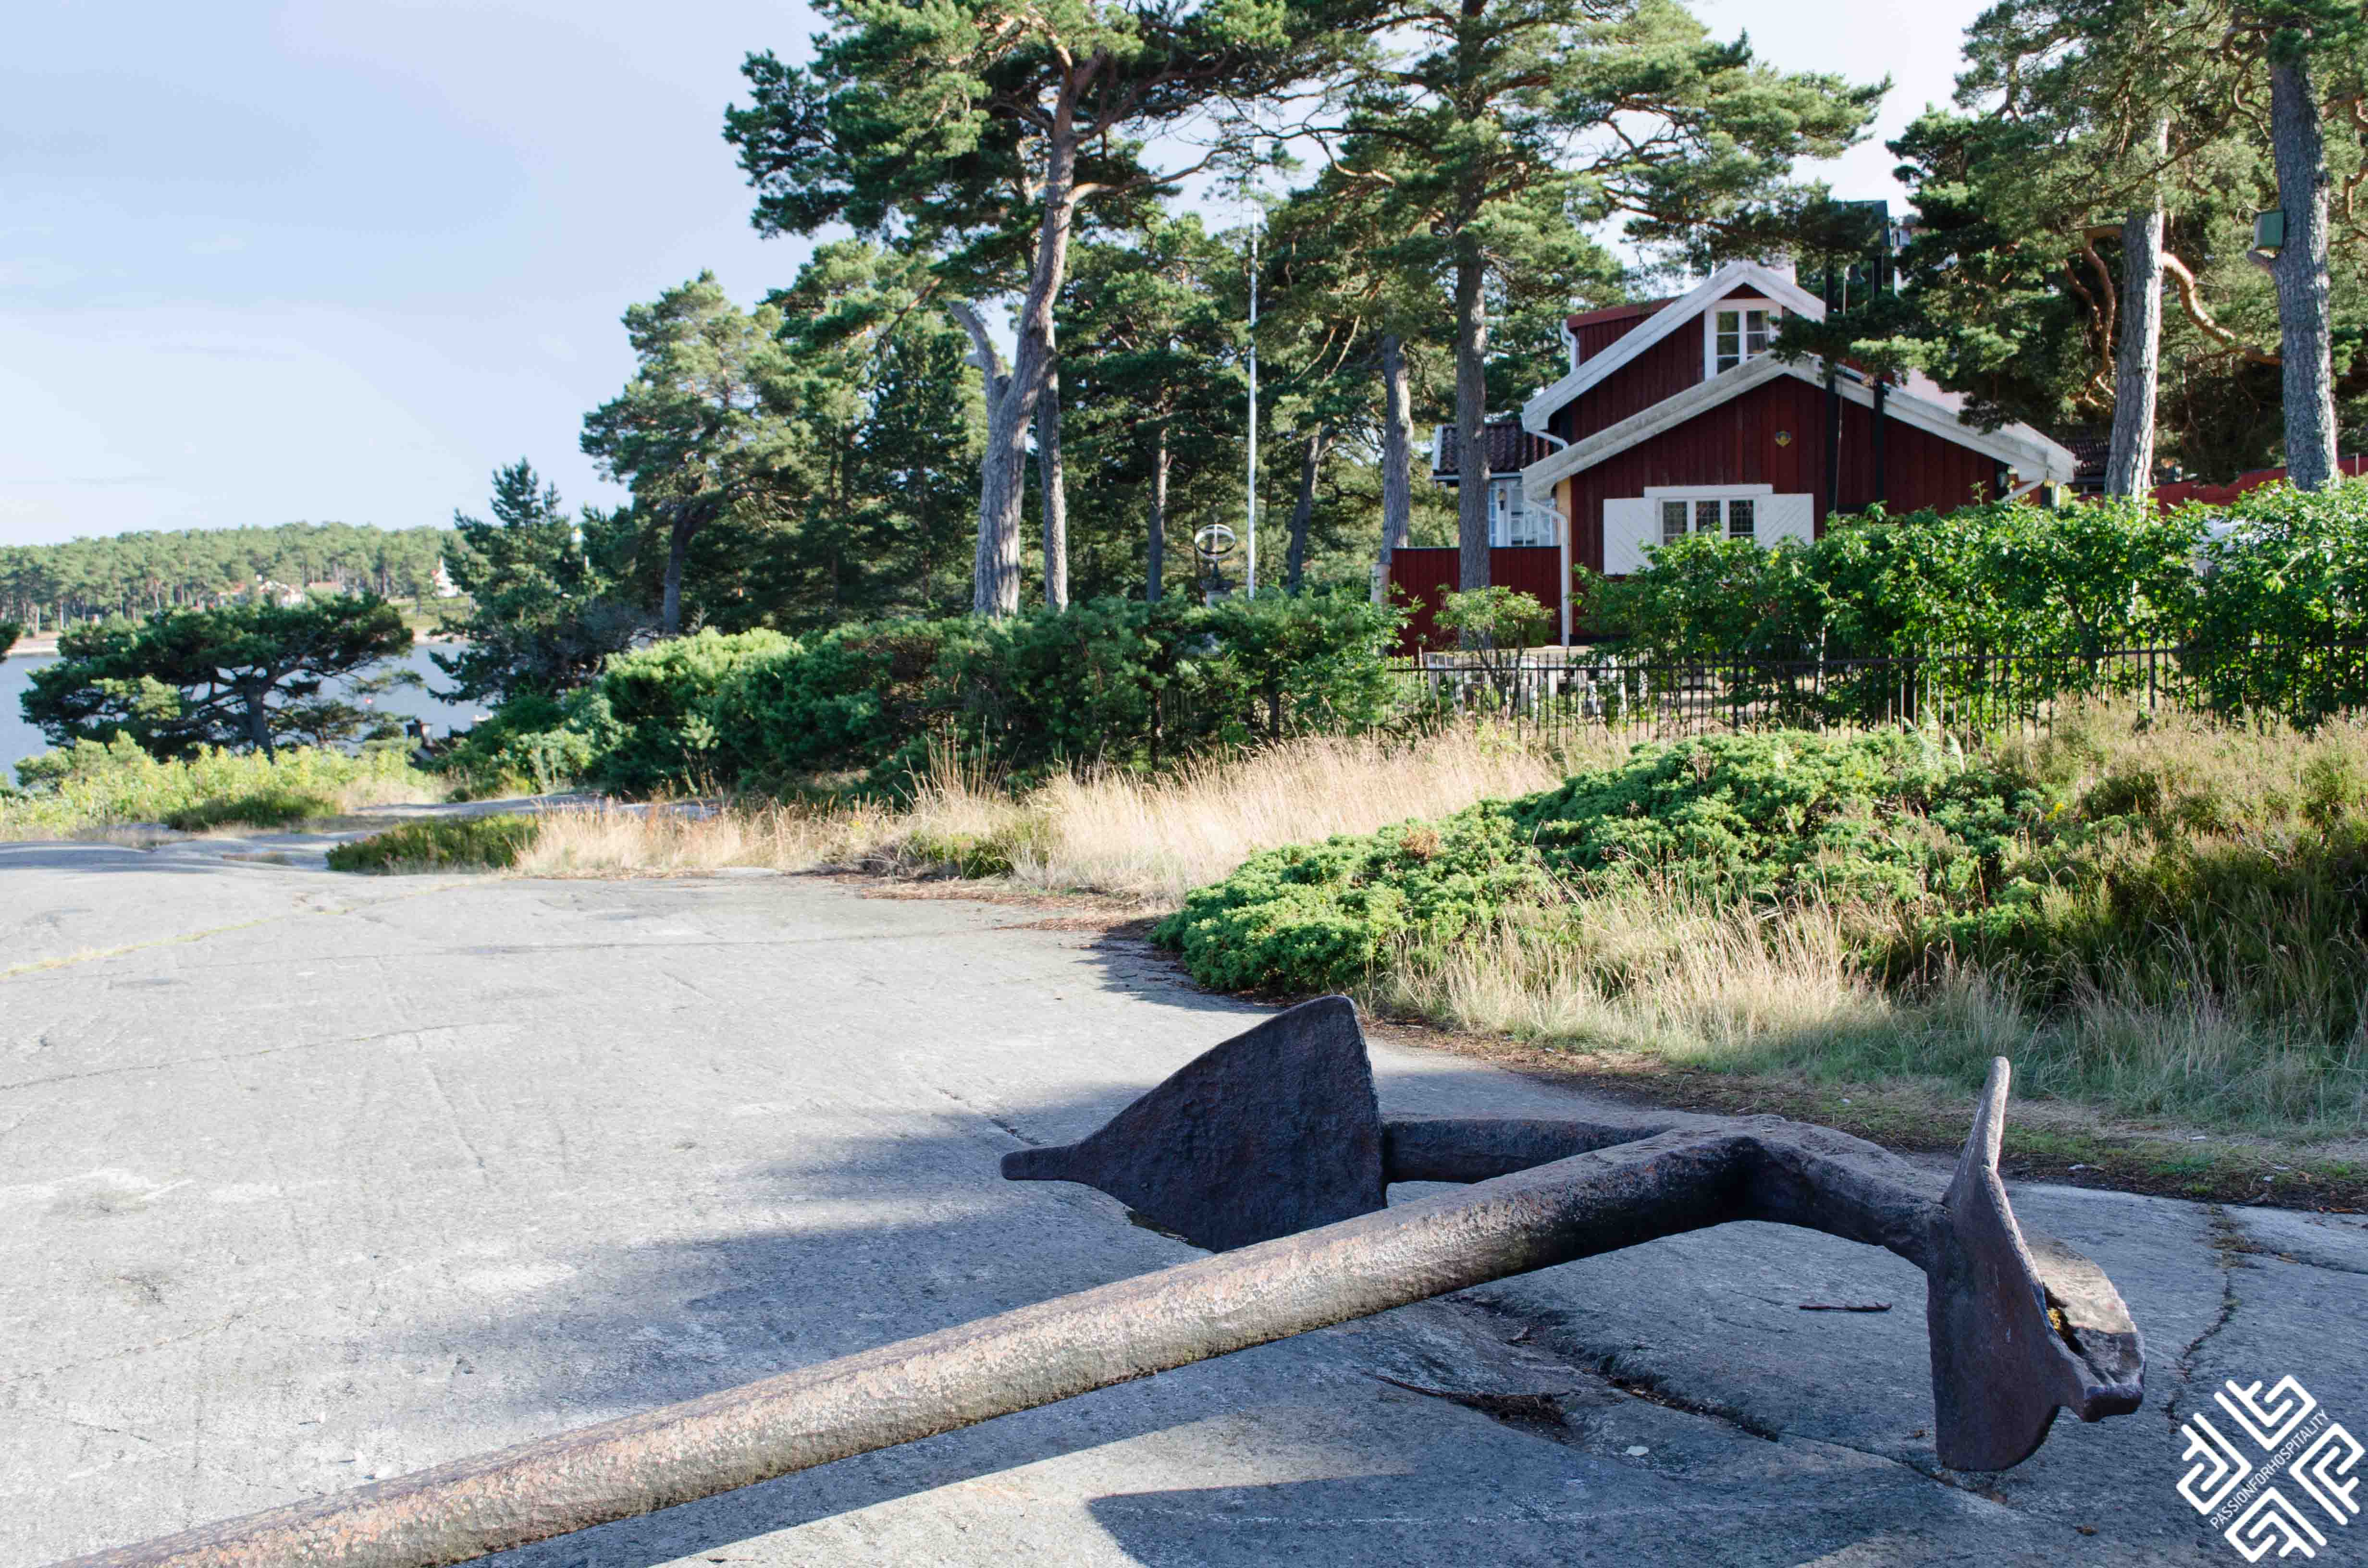 stockholm_archipelago_sandhamn-4